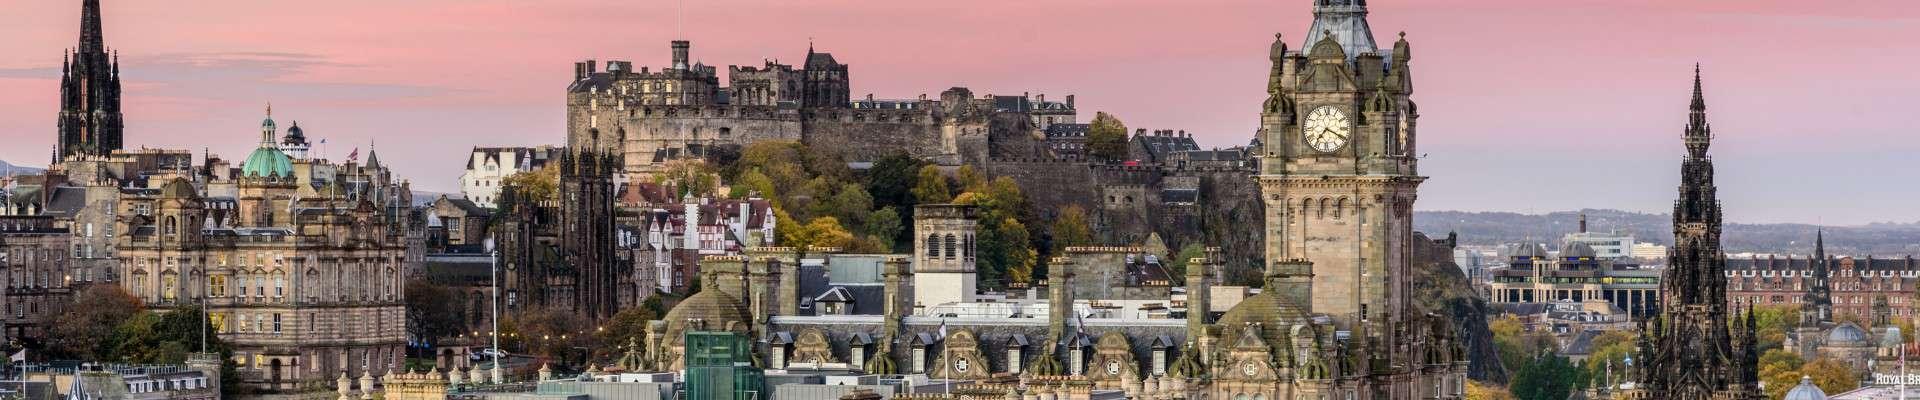 Edinburgh Properties Market